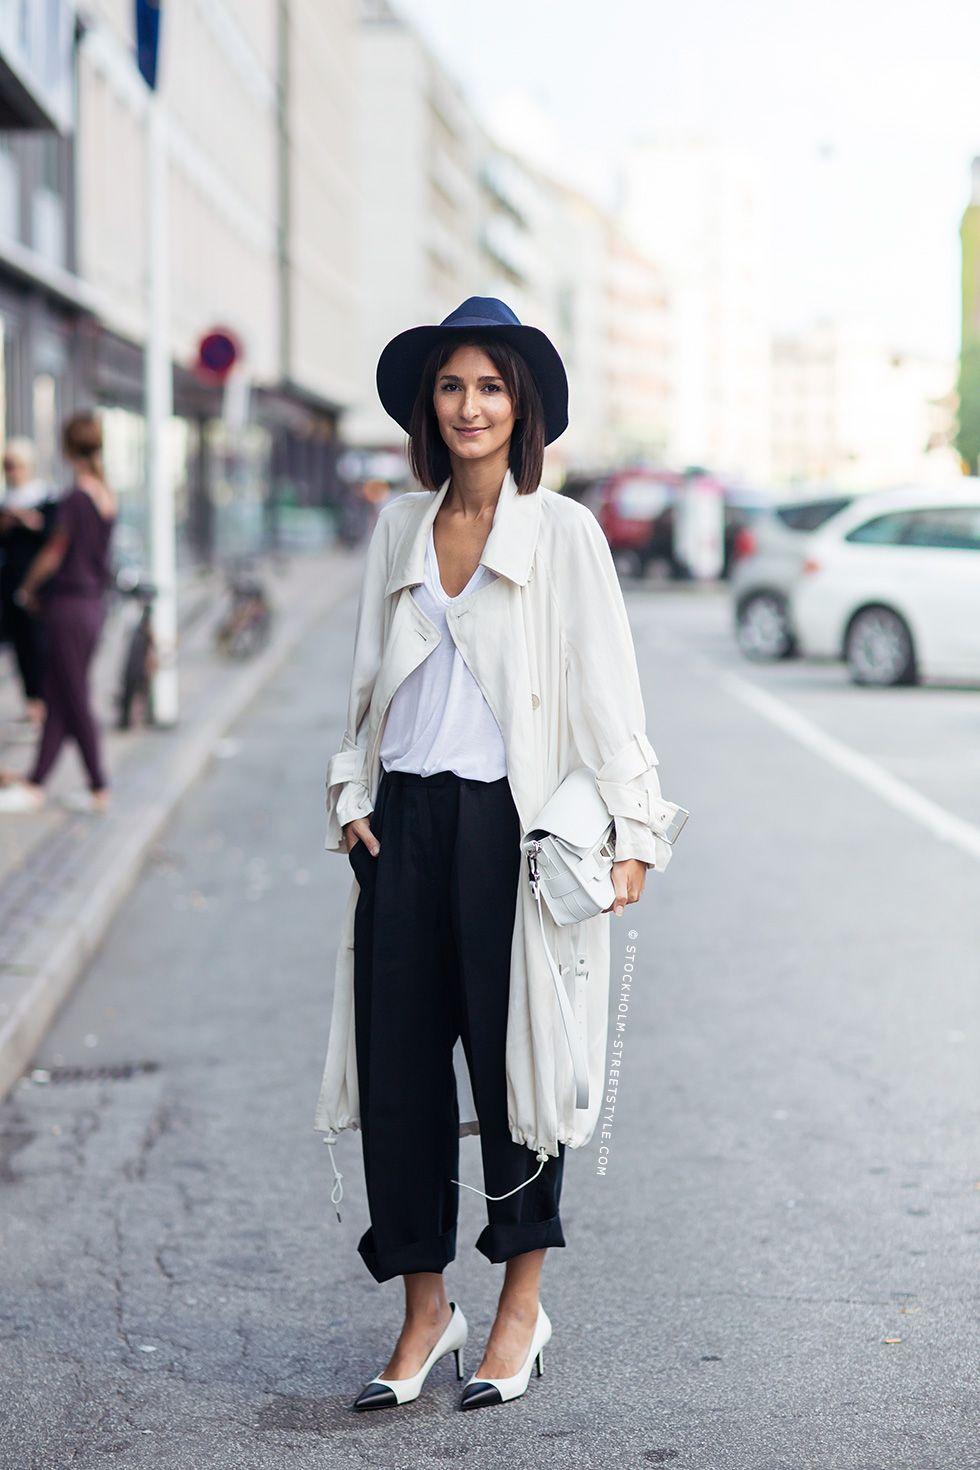 Golestaneh #chic #fashion #style #streetstyle